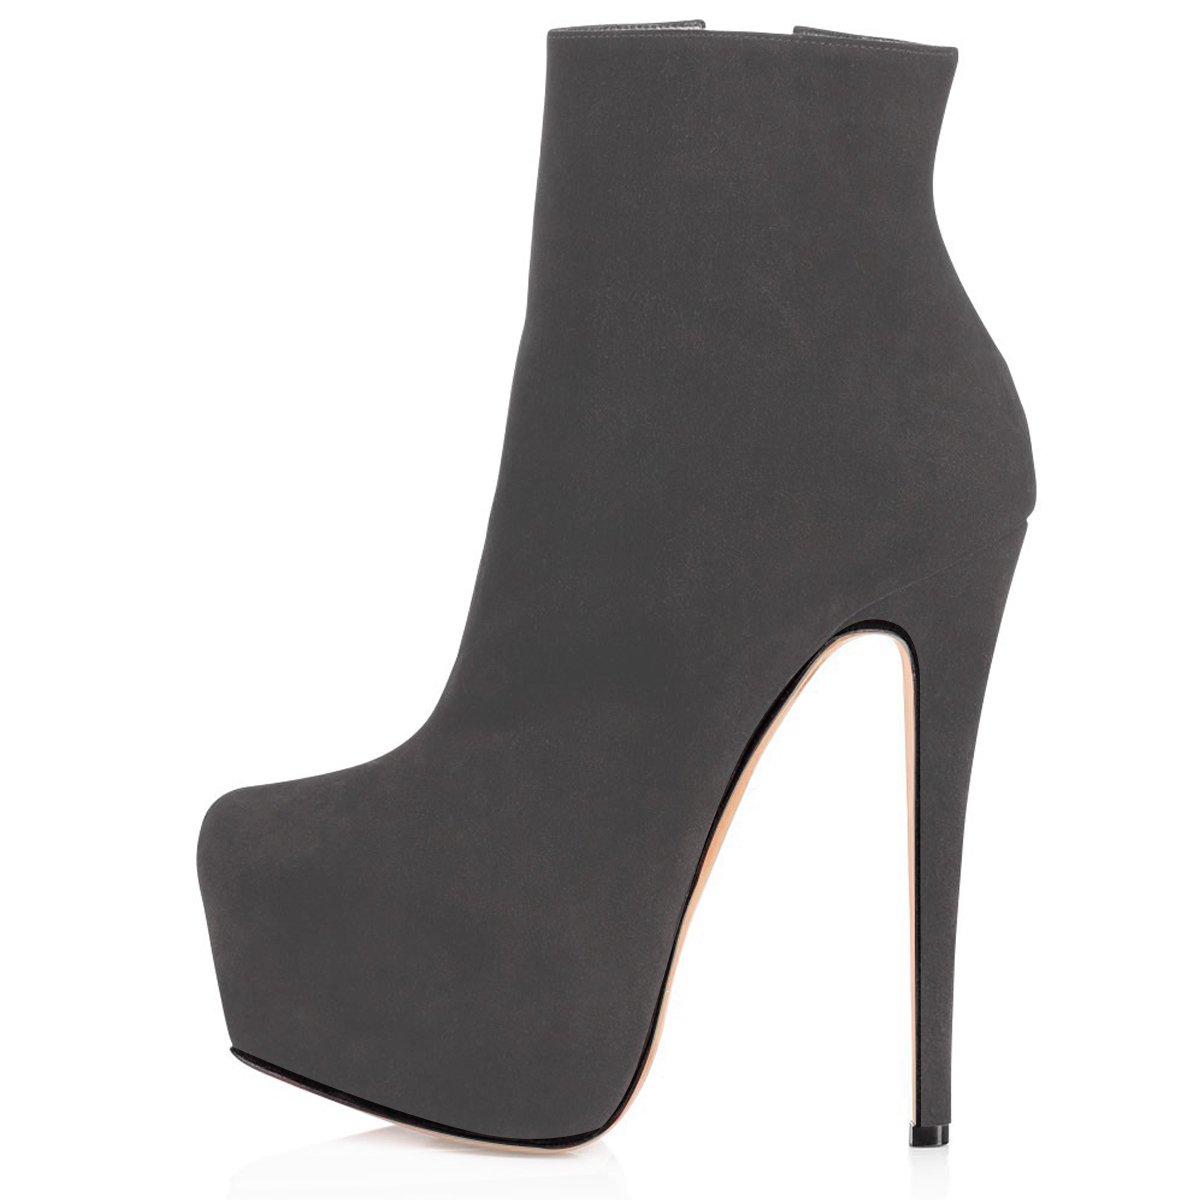 ELASHE Ankle Boots   15cmTrendige Damen Stiefeletten   Plateau Stiefel mit Absatz43 EU Grau